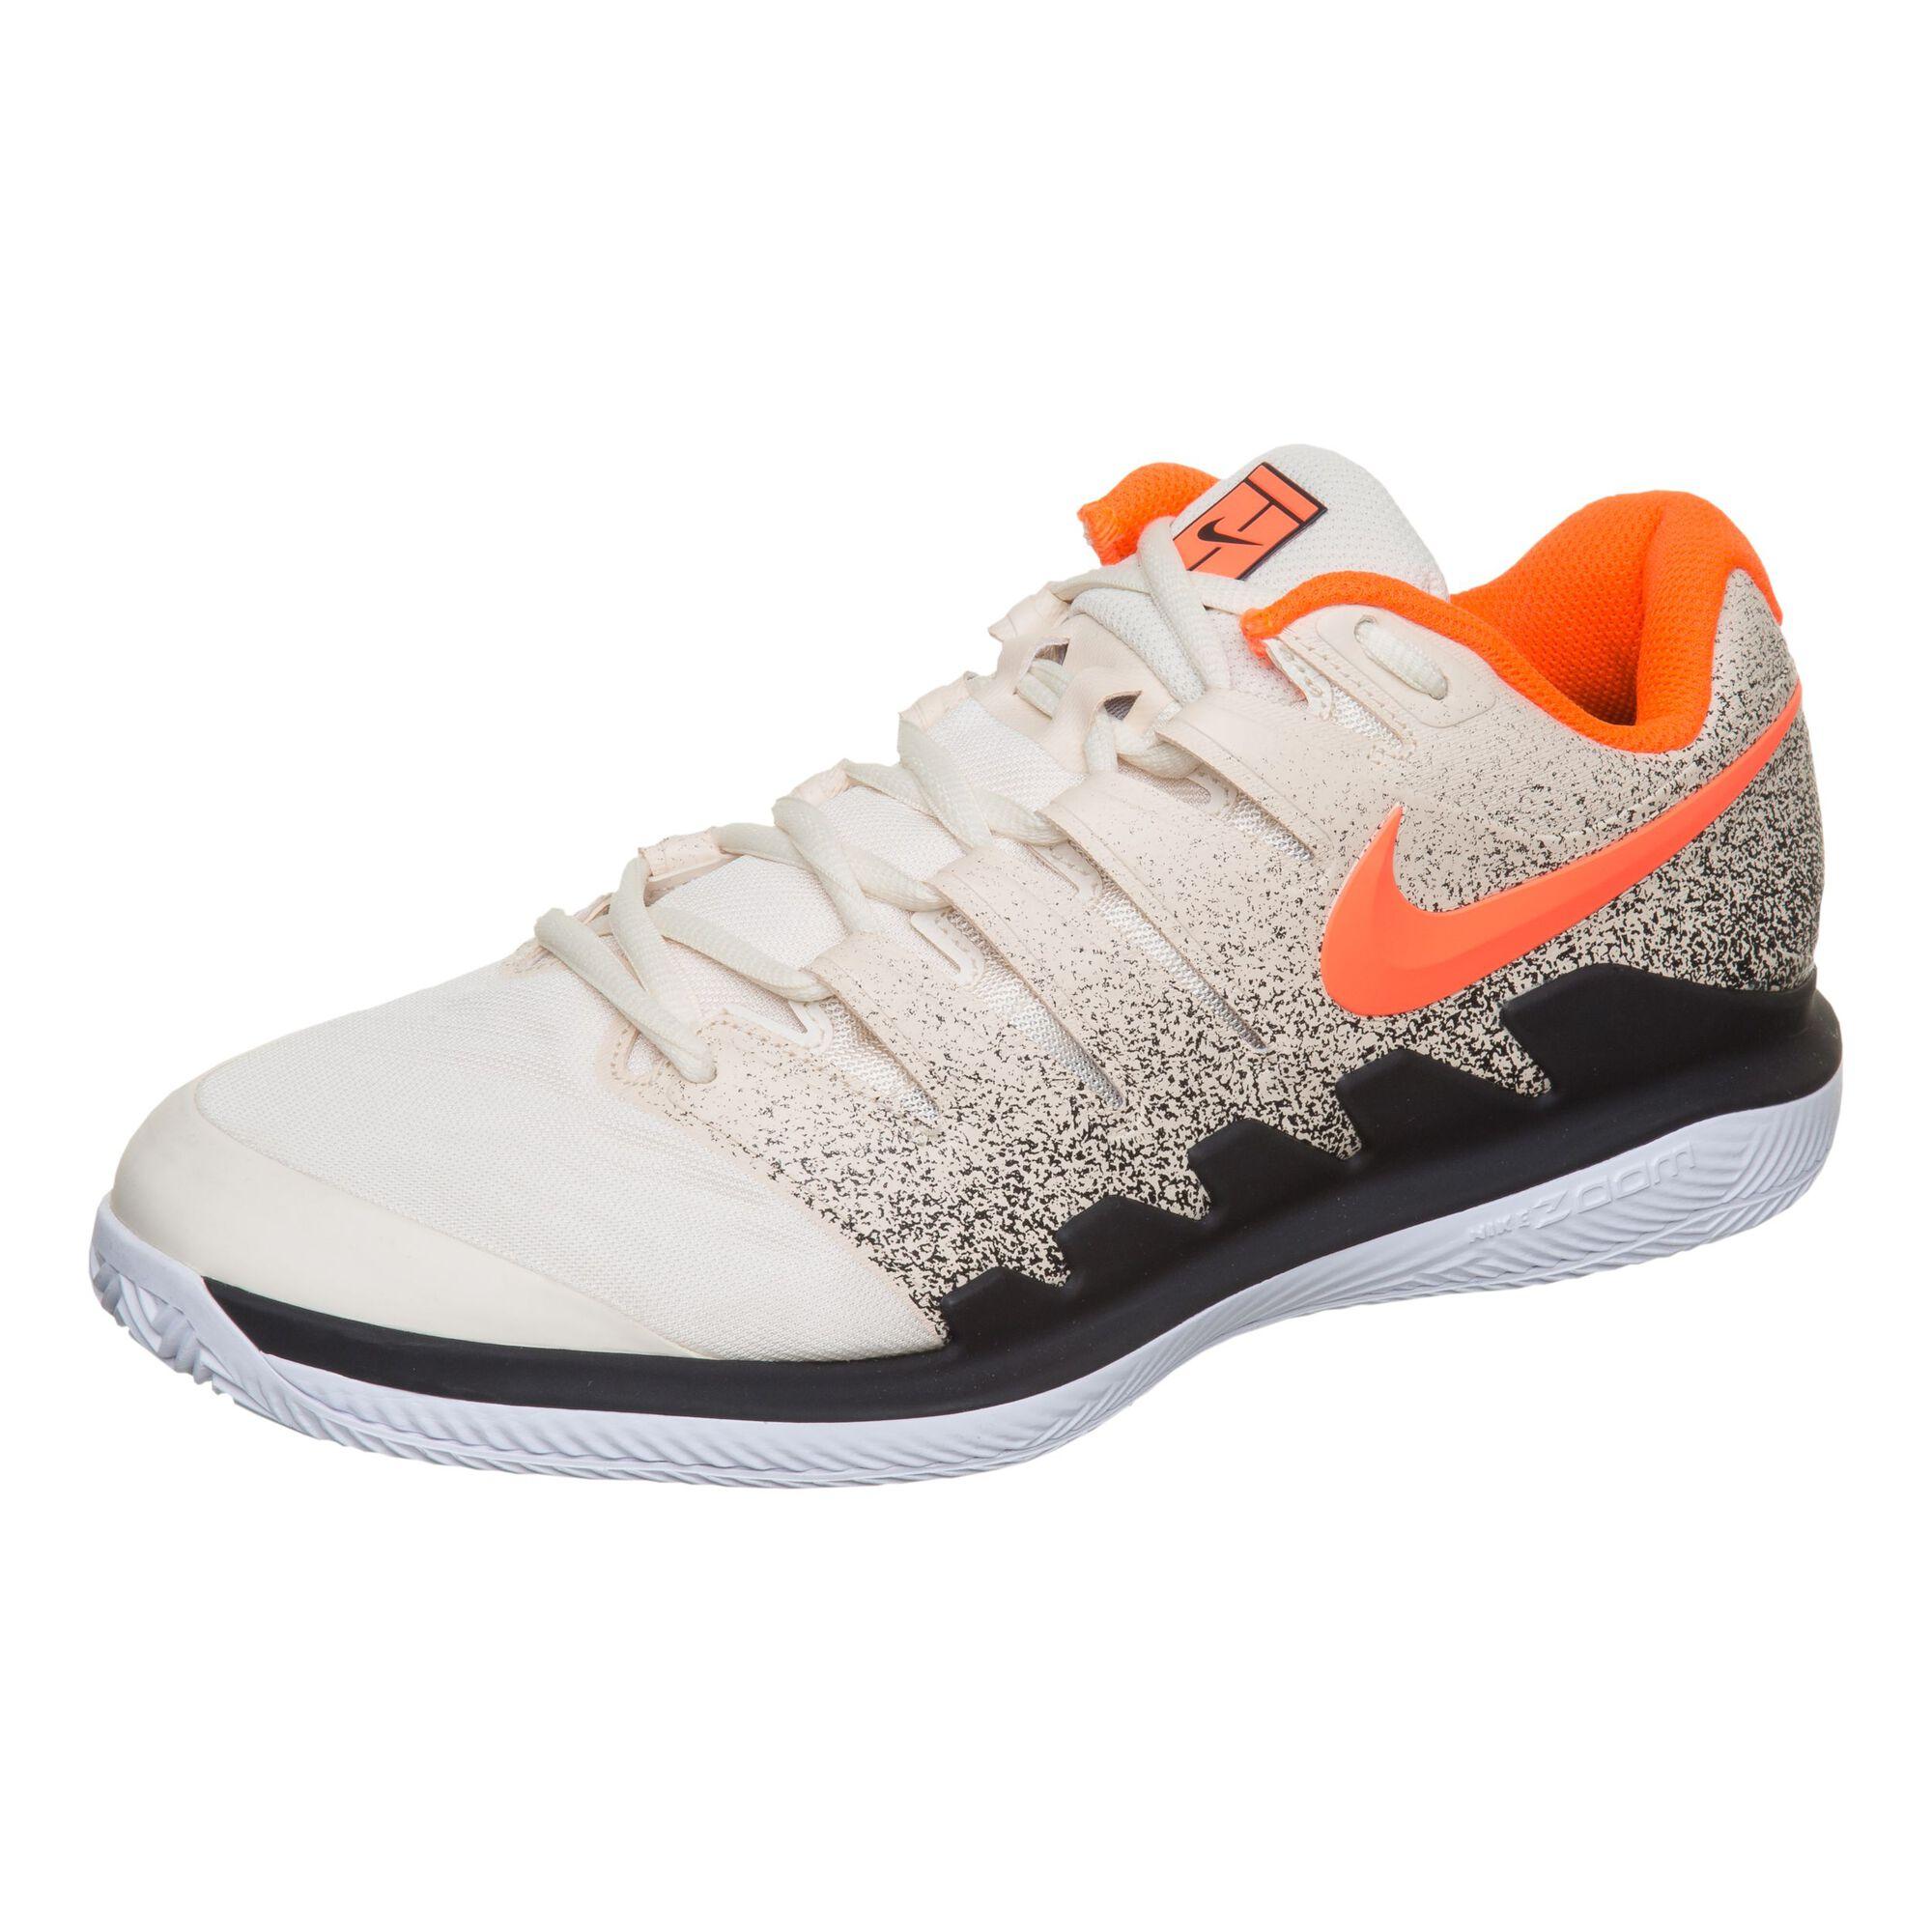 49aa63c984181 Nike  Nike  Nike  Nike  Nike  Nike  Nike  Nike  Nike  Nike  Nike. Air Zoom  Vapor X Clay ...